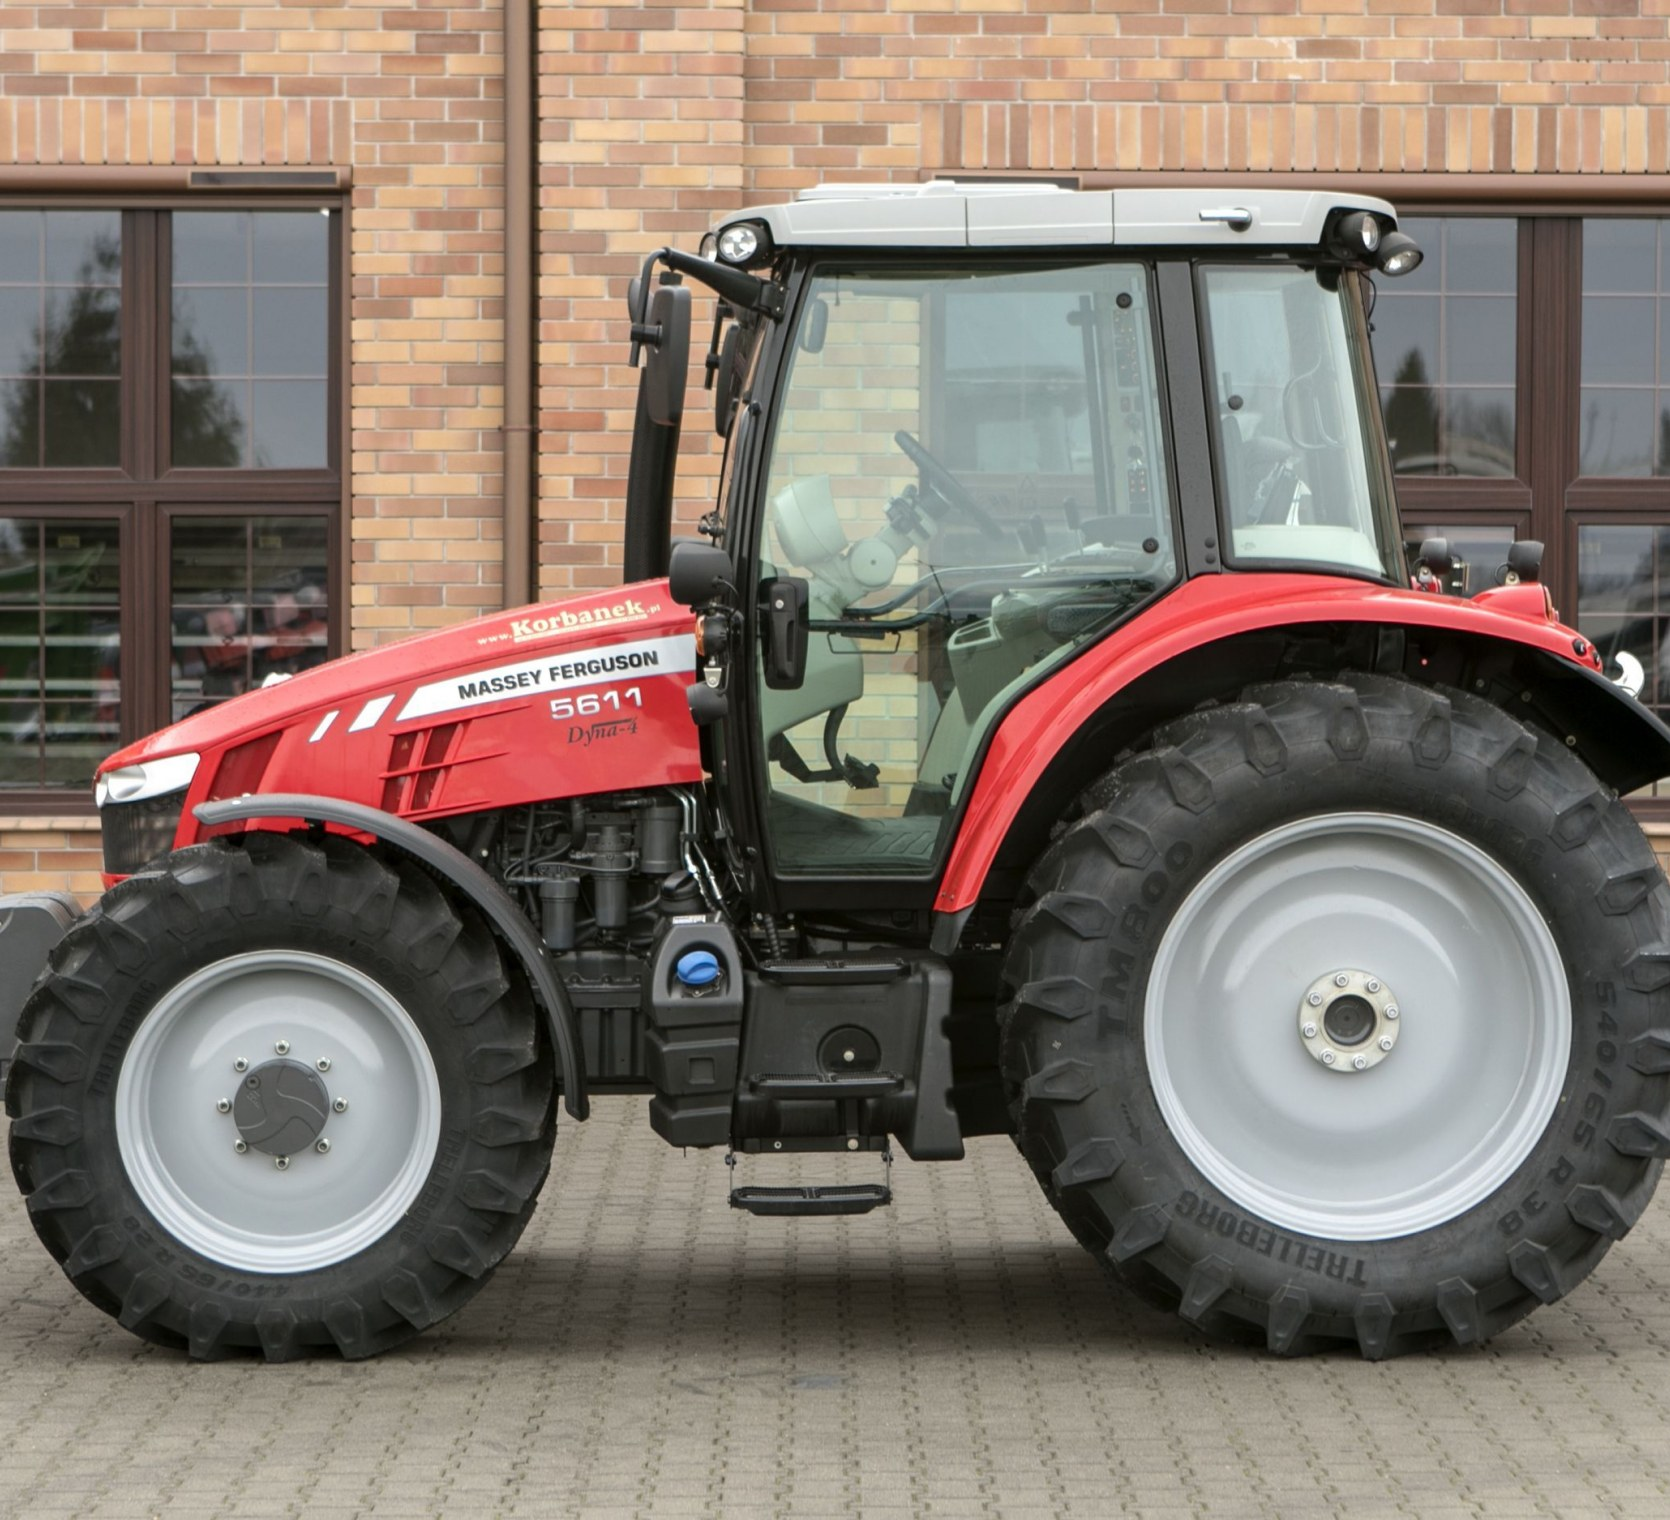 oferta ze strony korbanek.pl na traktor Massey Ferguson 5611 bok maszyny